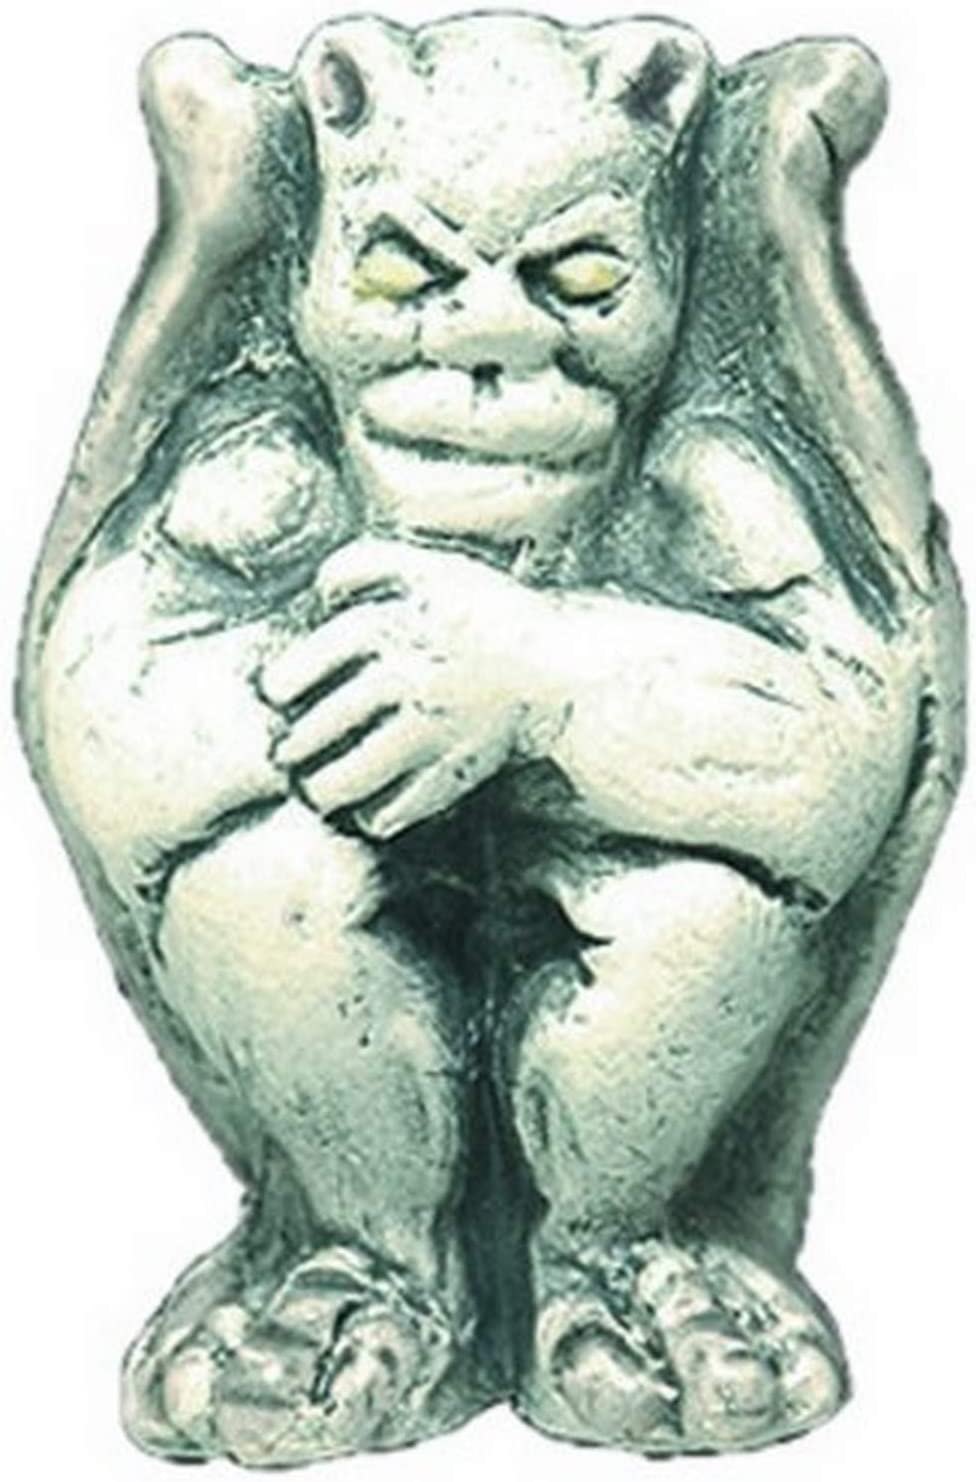 Shipwreck Beads 20 by 28mm Peruvian Hand Crafted Ceramic Gargoyle Beads 3-Per-Pack Gray